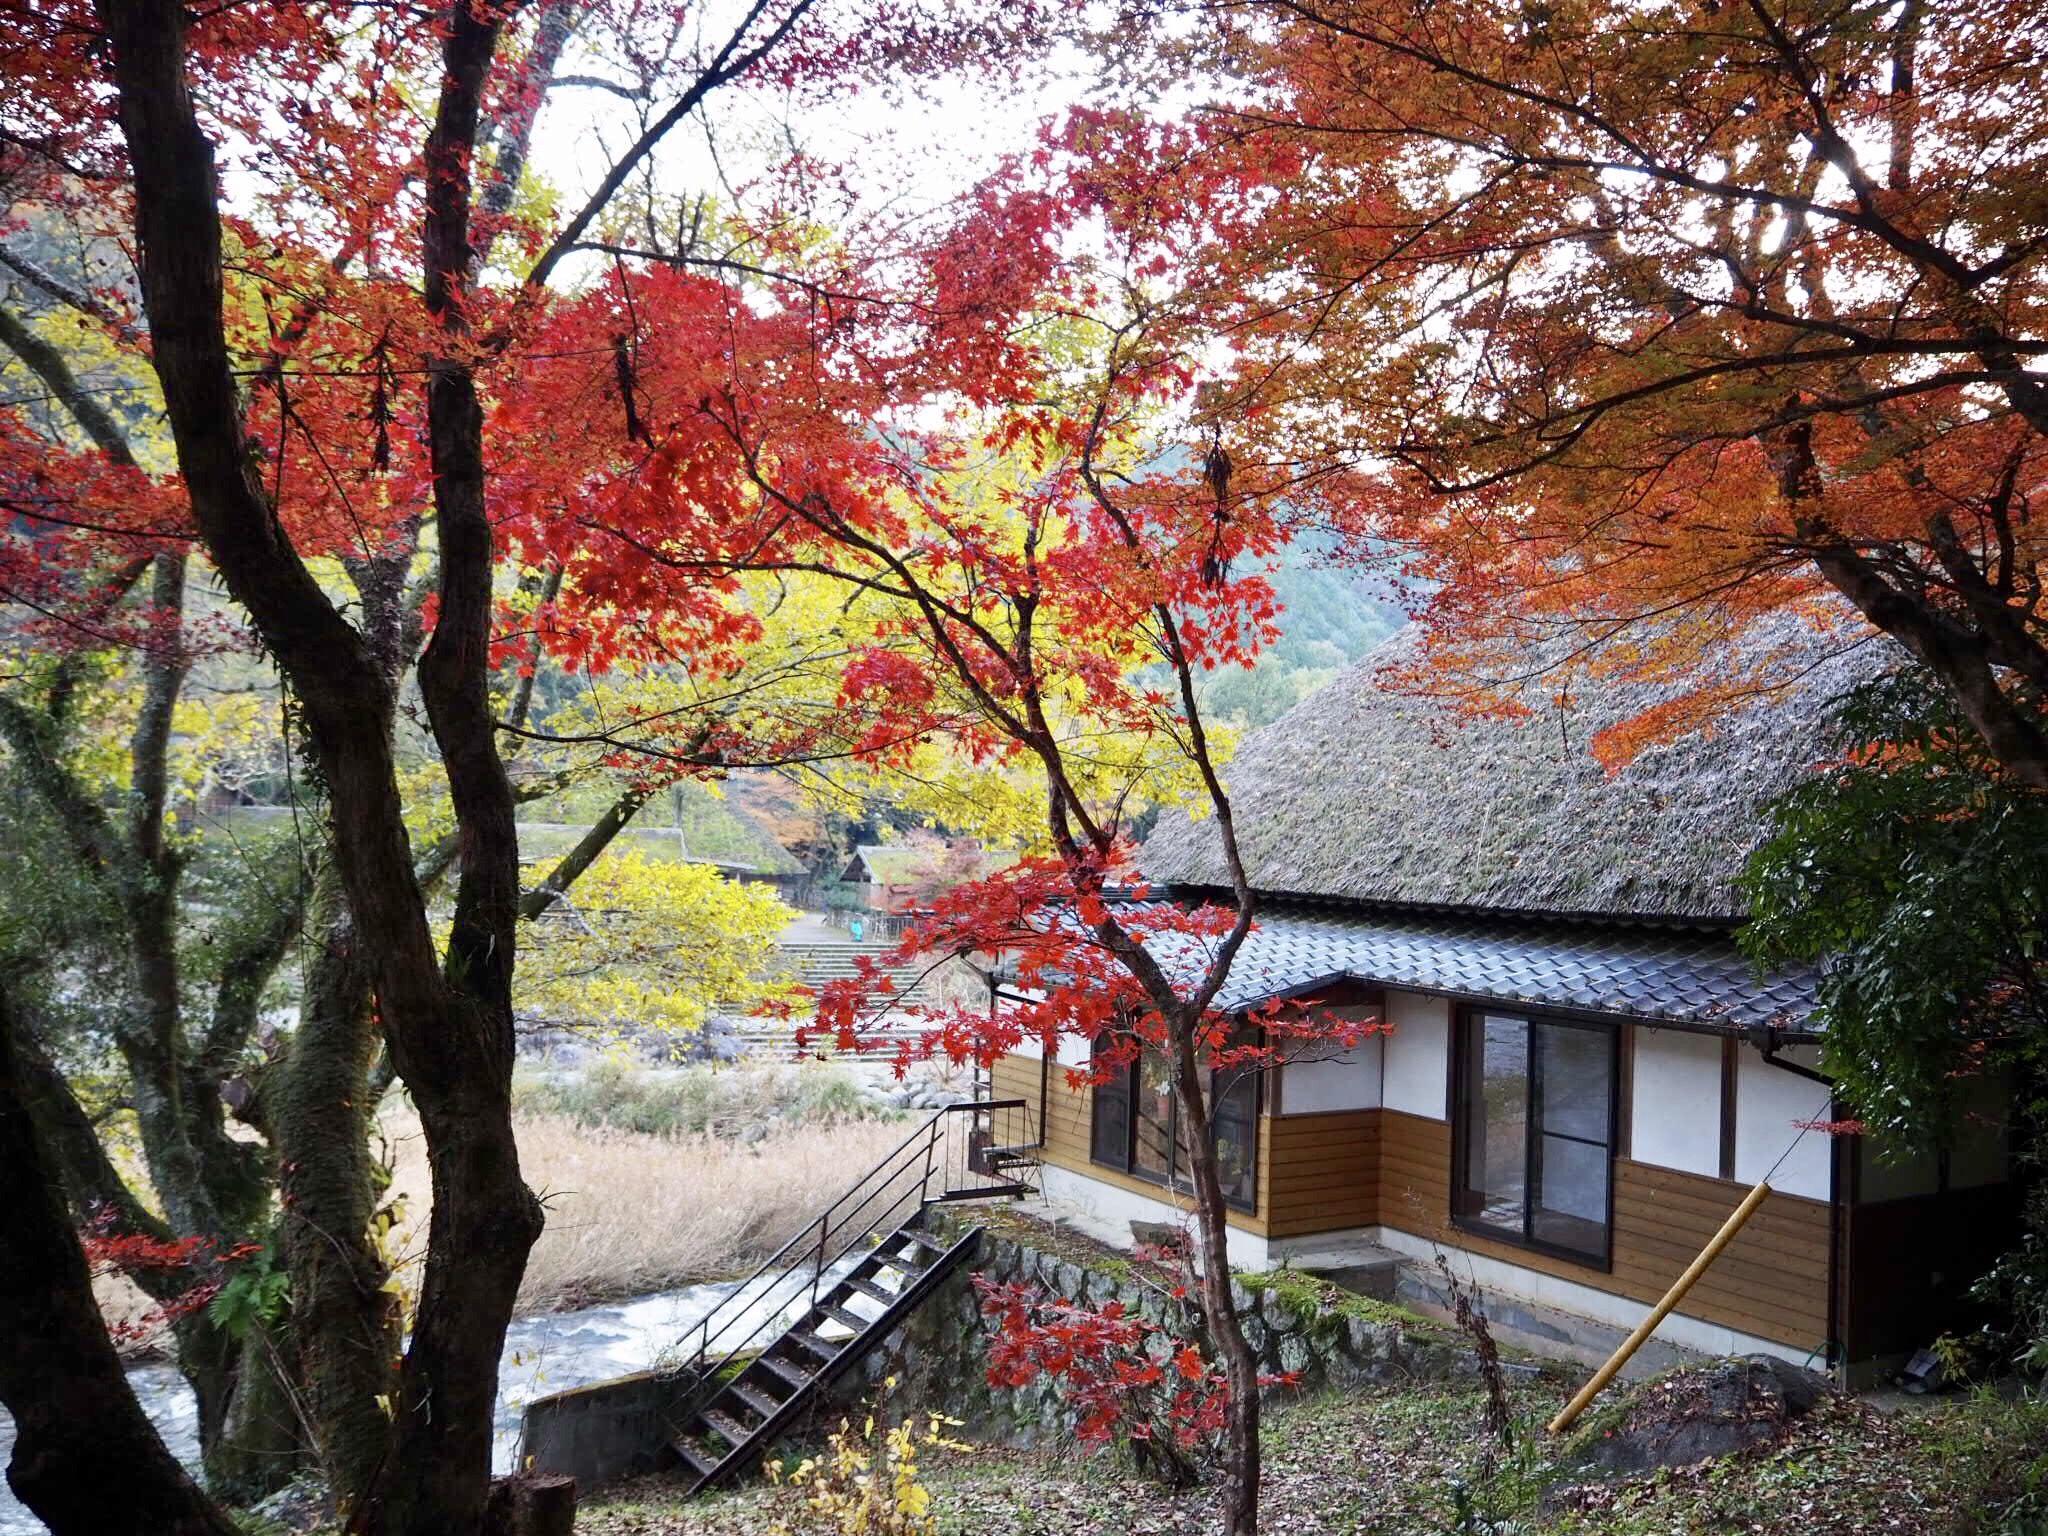 img 7525 - 香嵐渓 - 日本の秋を感じる 愛知県豊田市の紅葉スポット